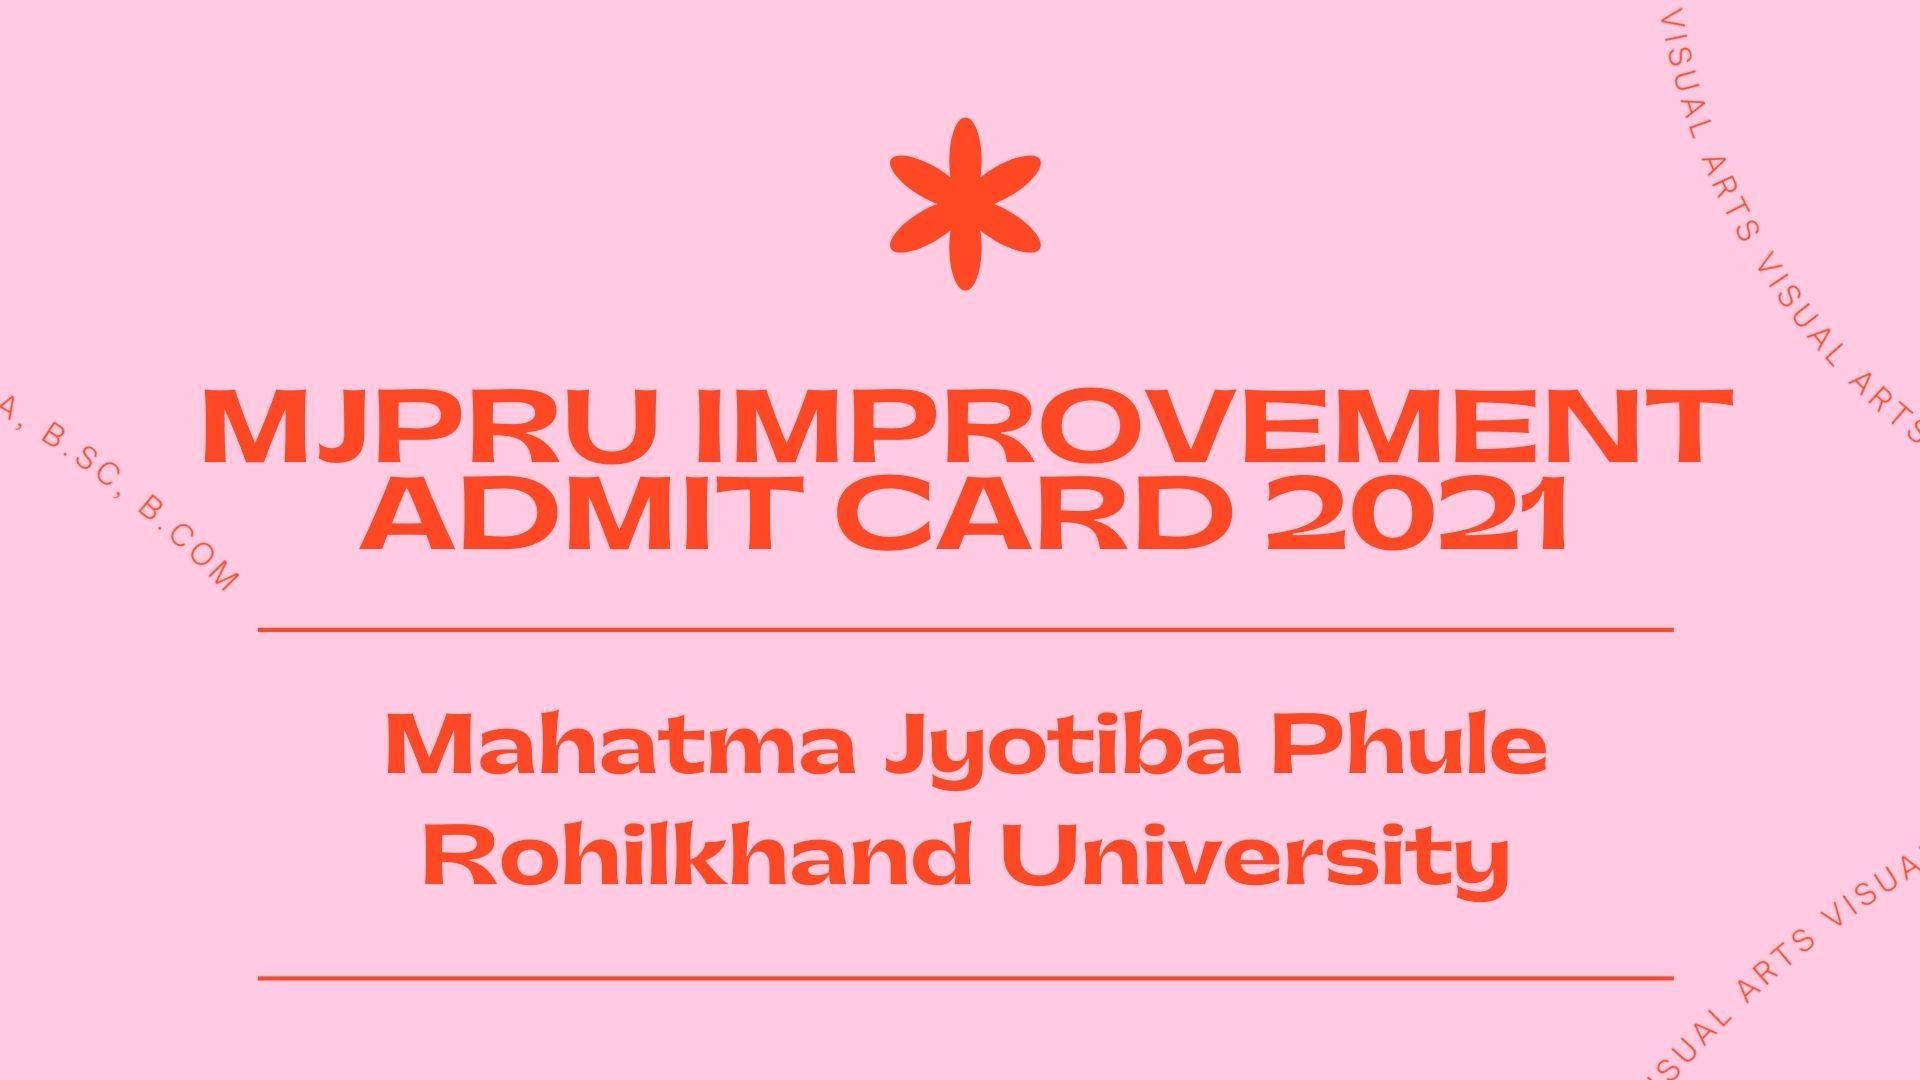 Mjpru Admit Card Name Wise 4 In 2021 University Exam Name Wise Cards